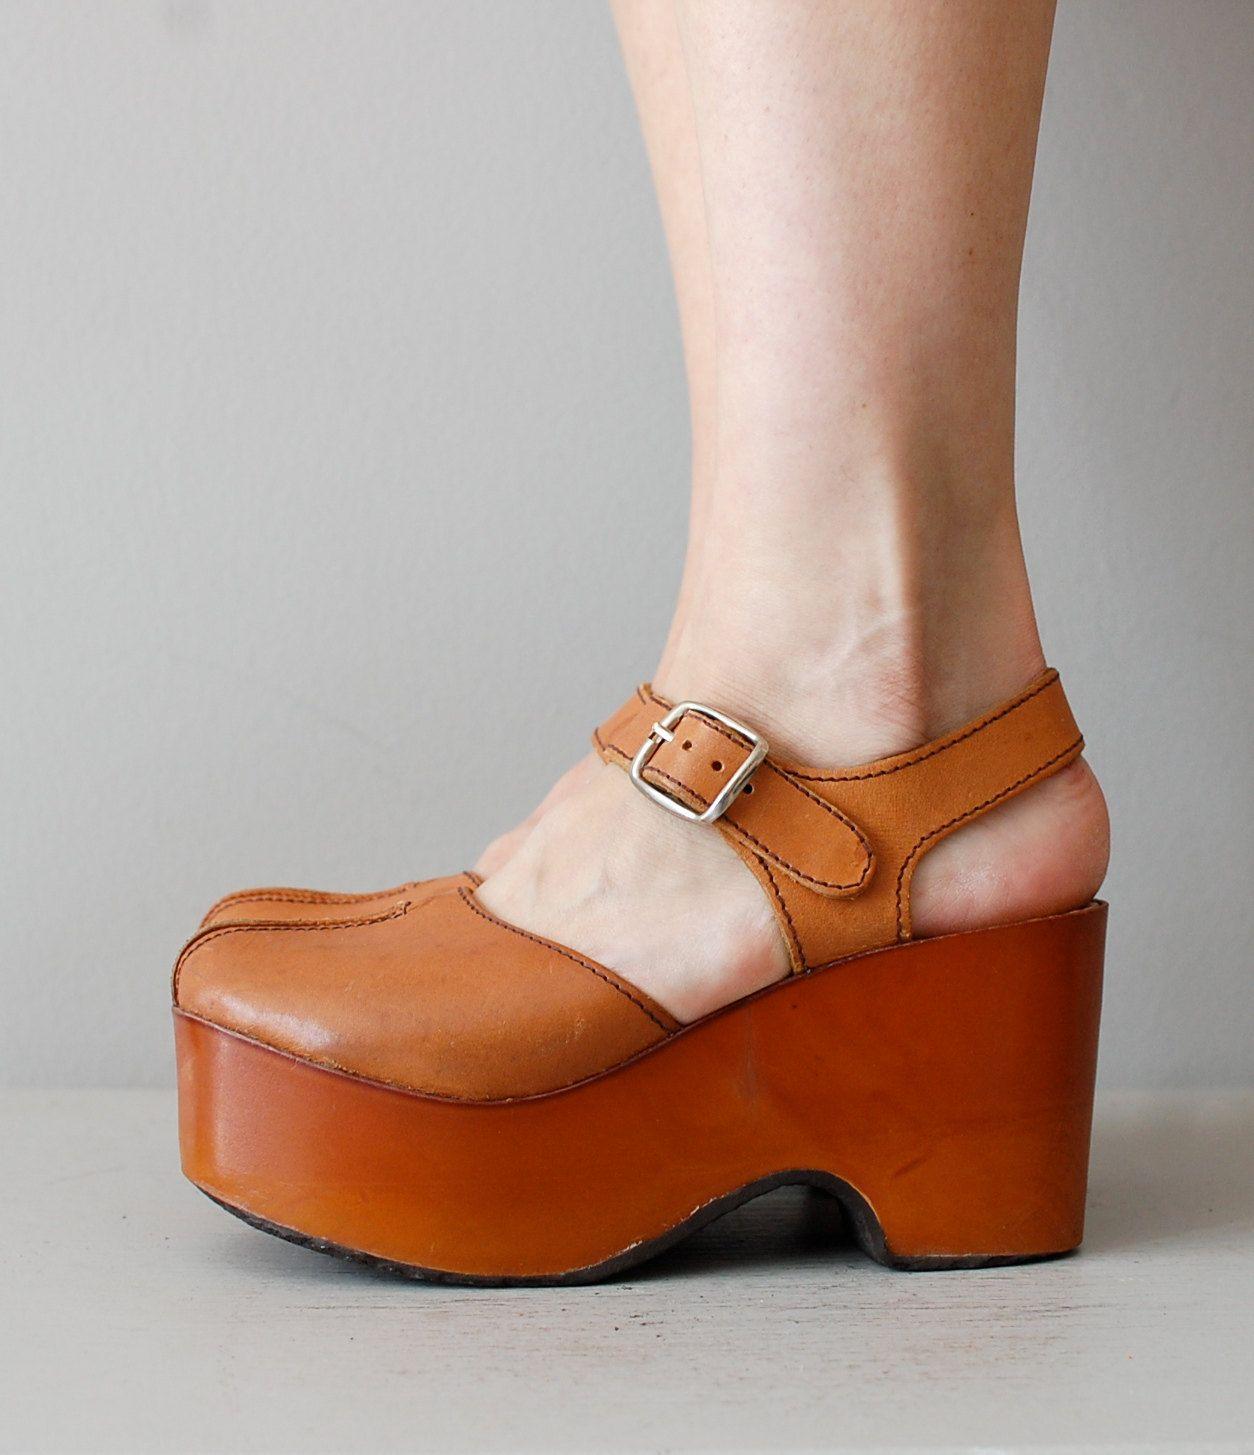 d78acd18bb platform shoes / 1970s wooden platforms / Platform Mary Janes. $225.00, via  Etsy.